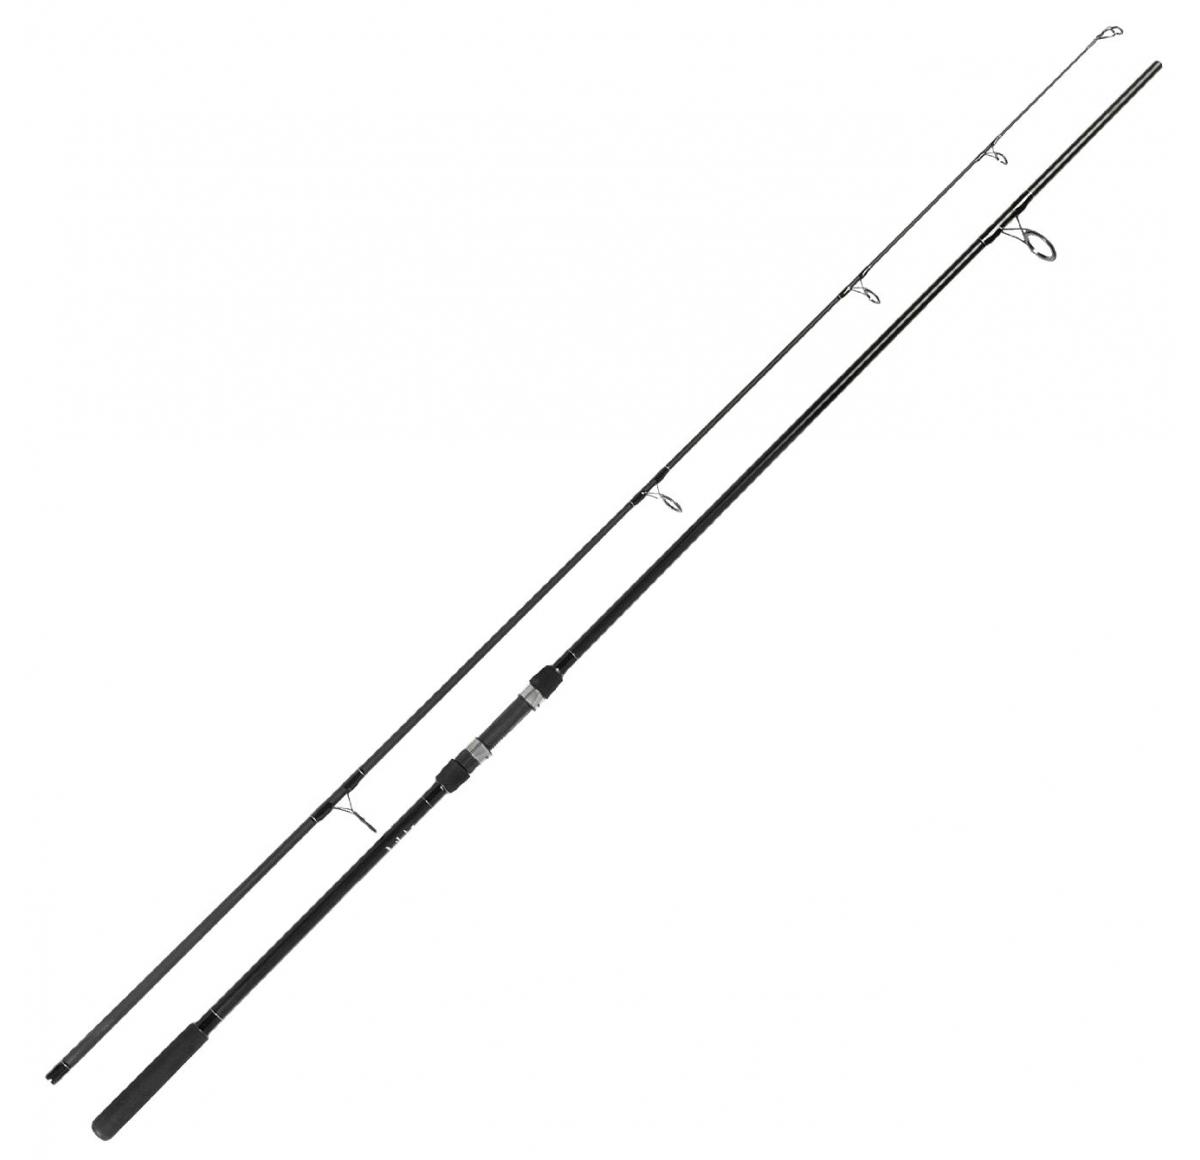 Grauvell Vorteks Sekret 12 ft 3.5 lbs